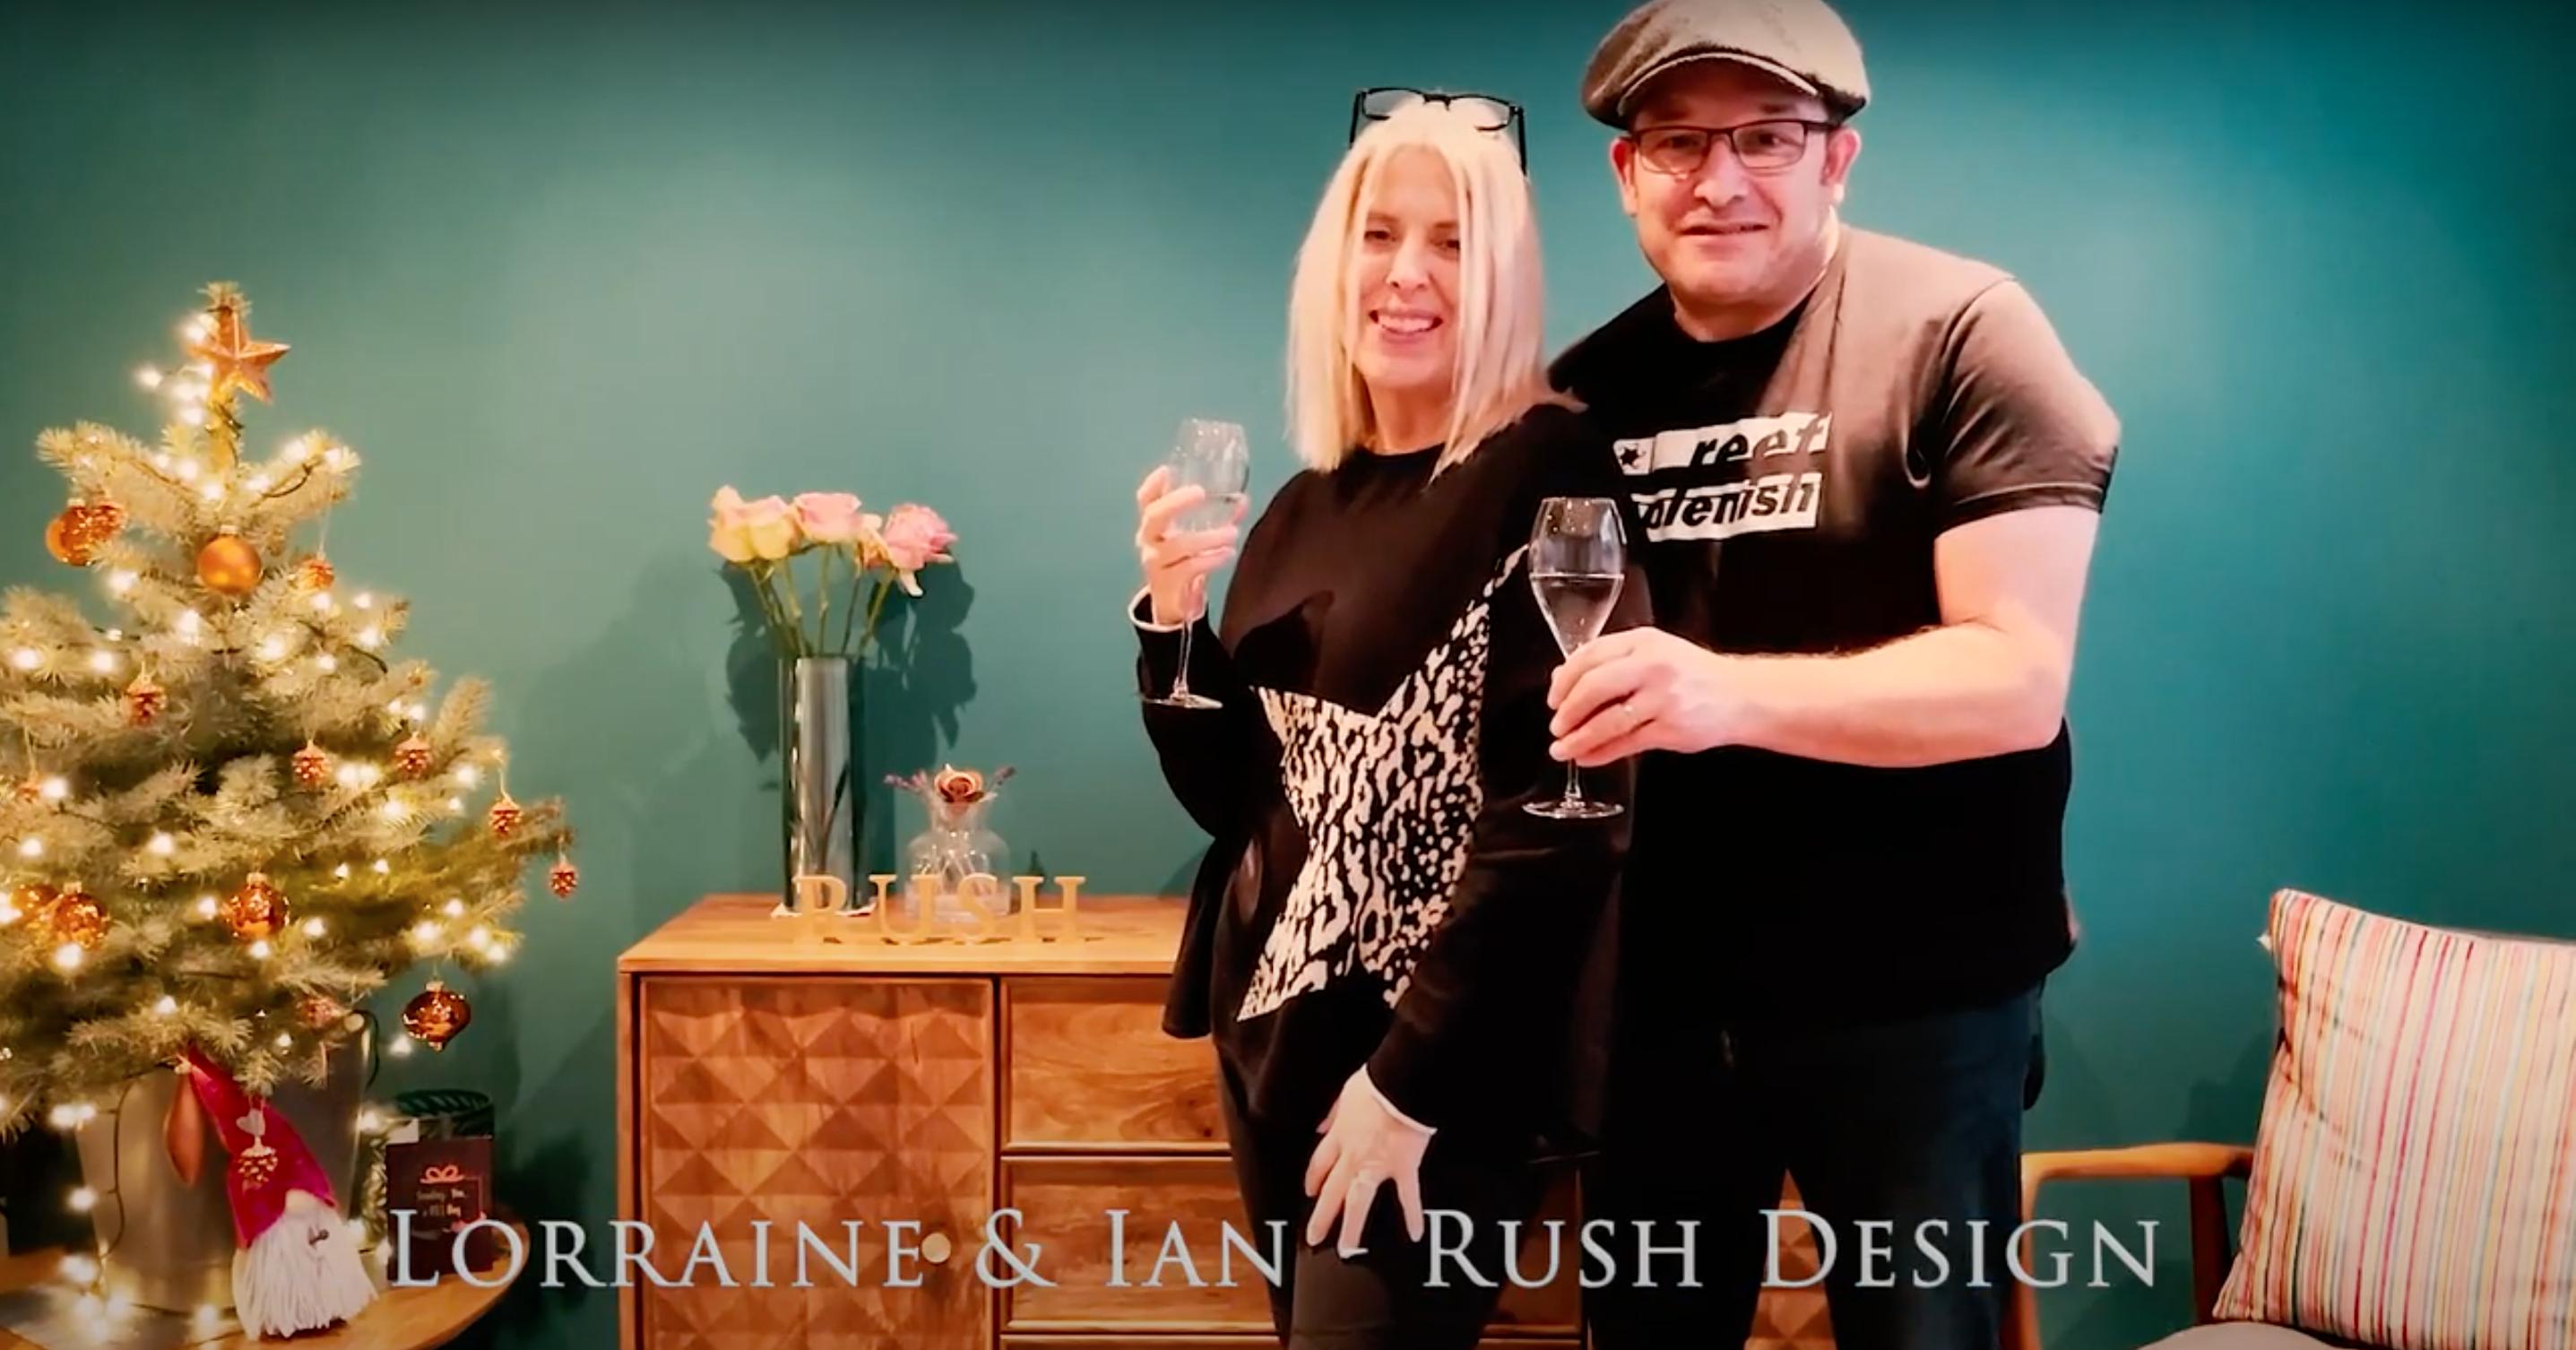 Above: Lorraine and Ian Bradley of Rush Design said 'cheers' to retailers.